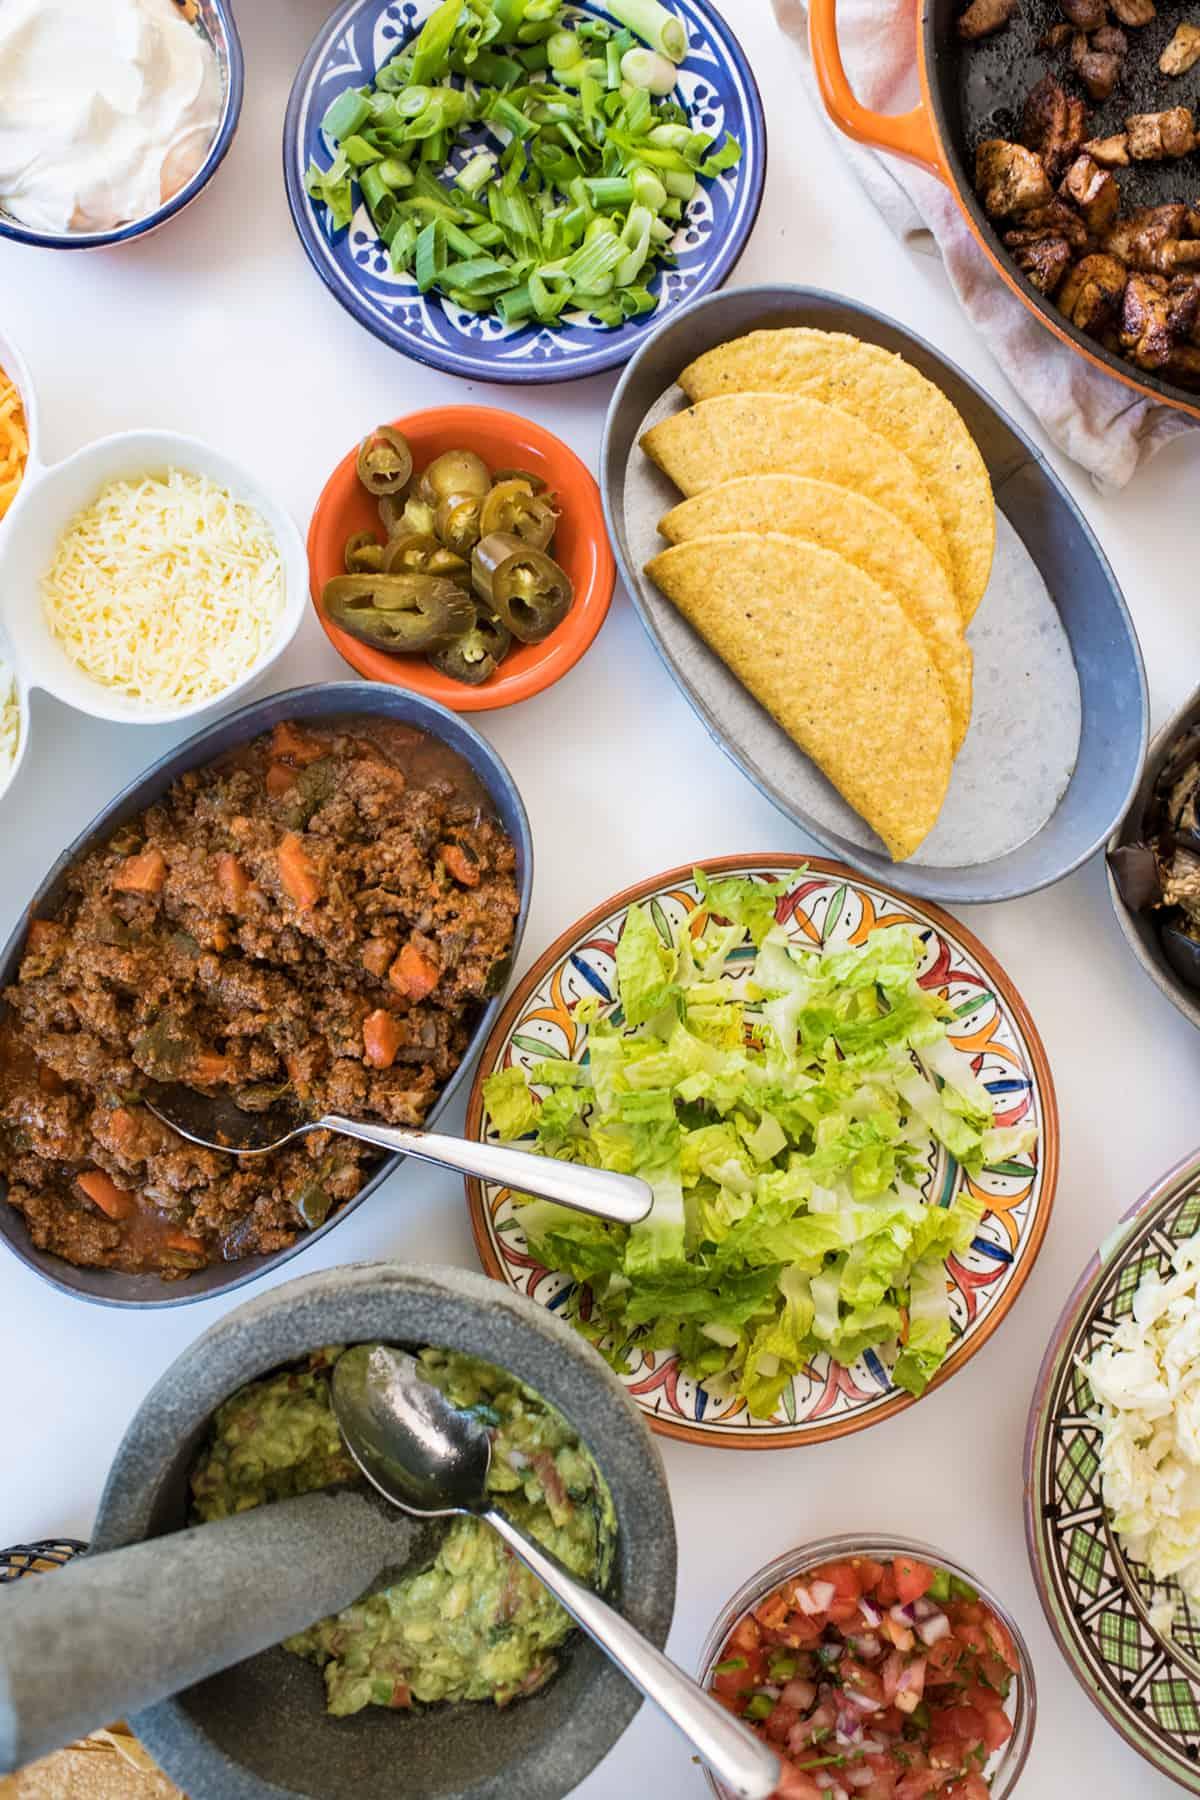 Ultimate taco bar night spread